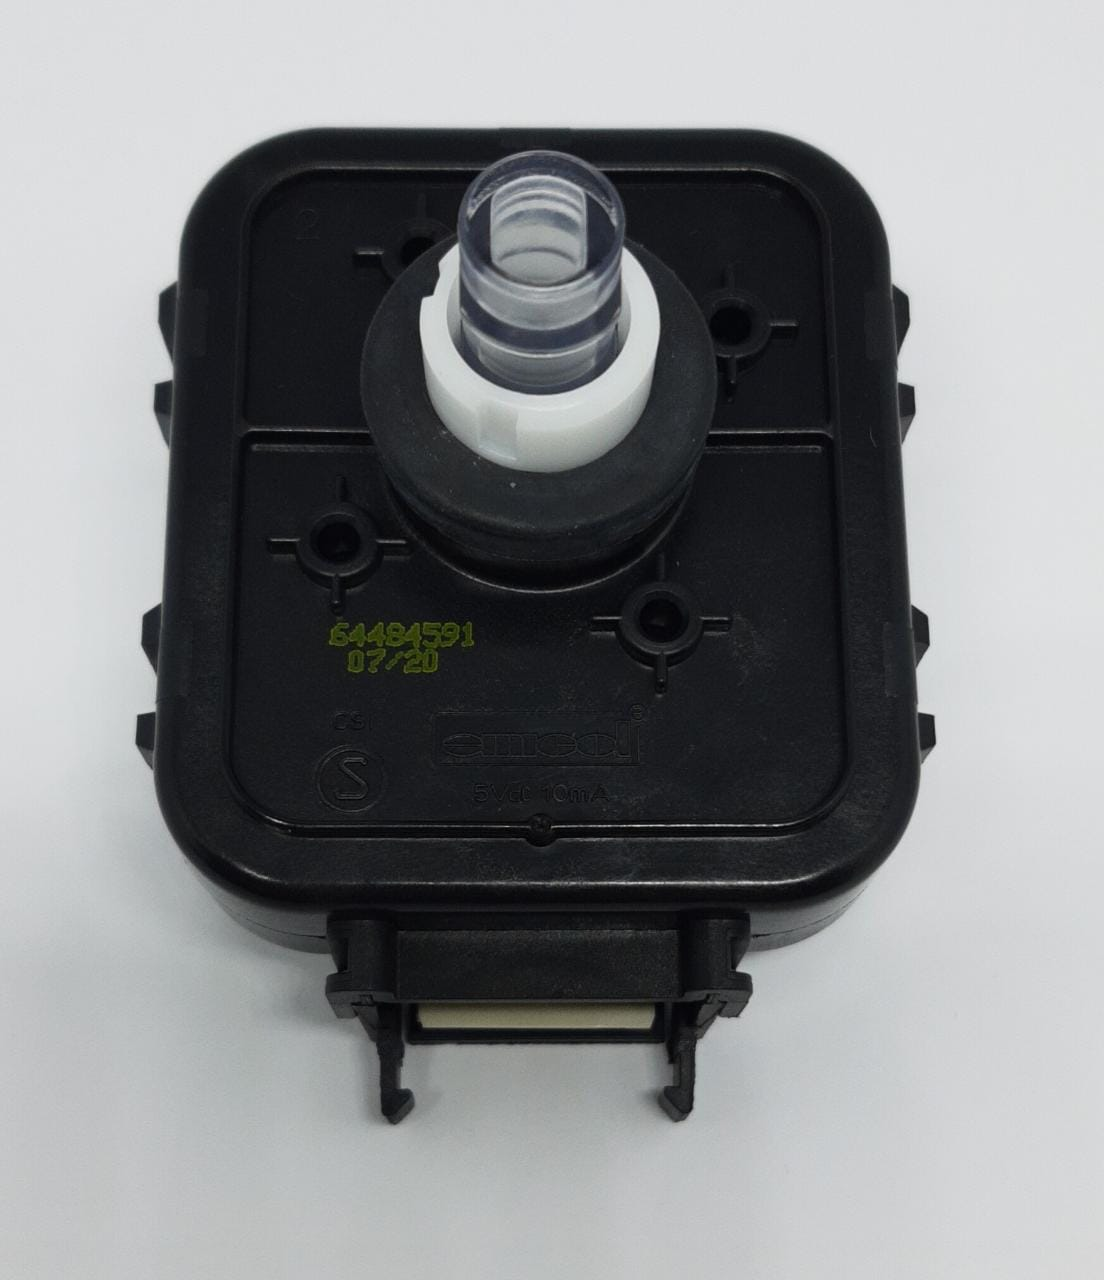 Chave Seletora Electrolux Ltr10 12 15 Lts12 Ls12 - 64484591